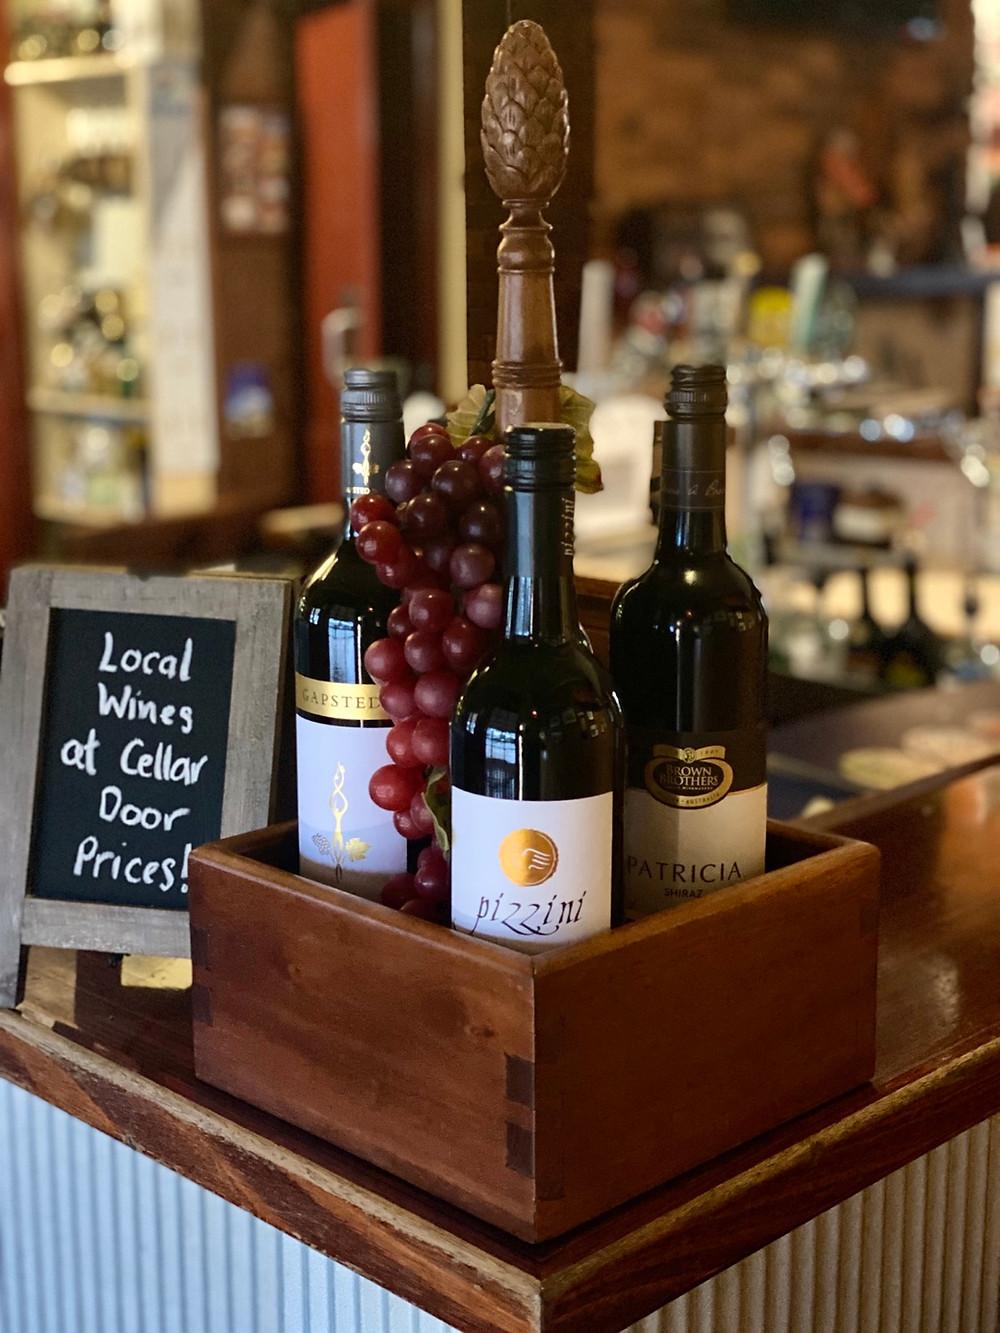 Cellar door priced wines at The Vine